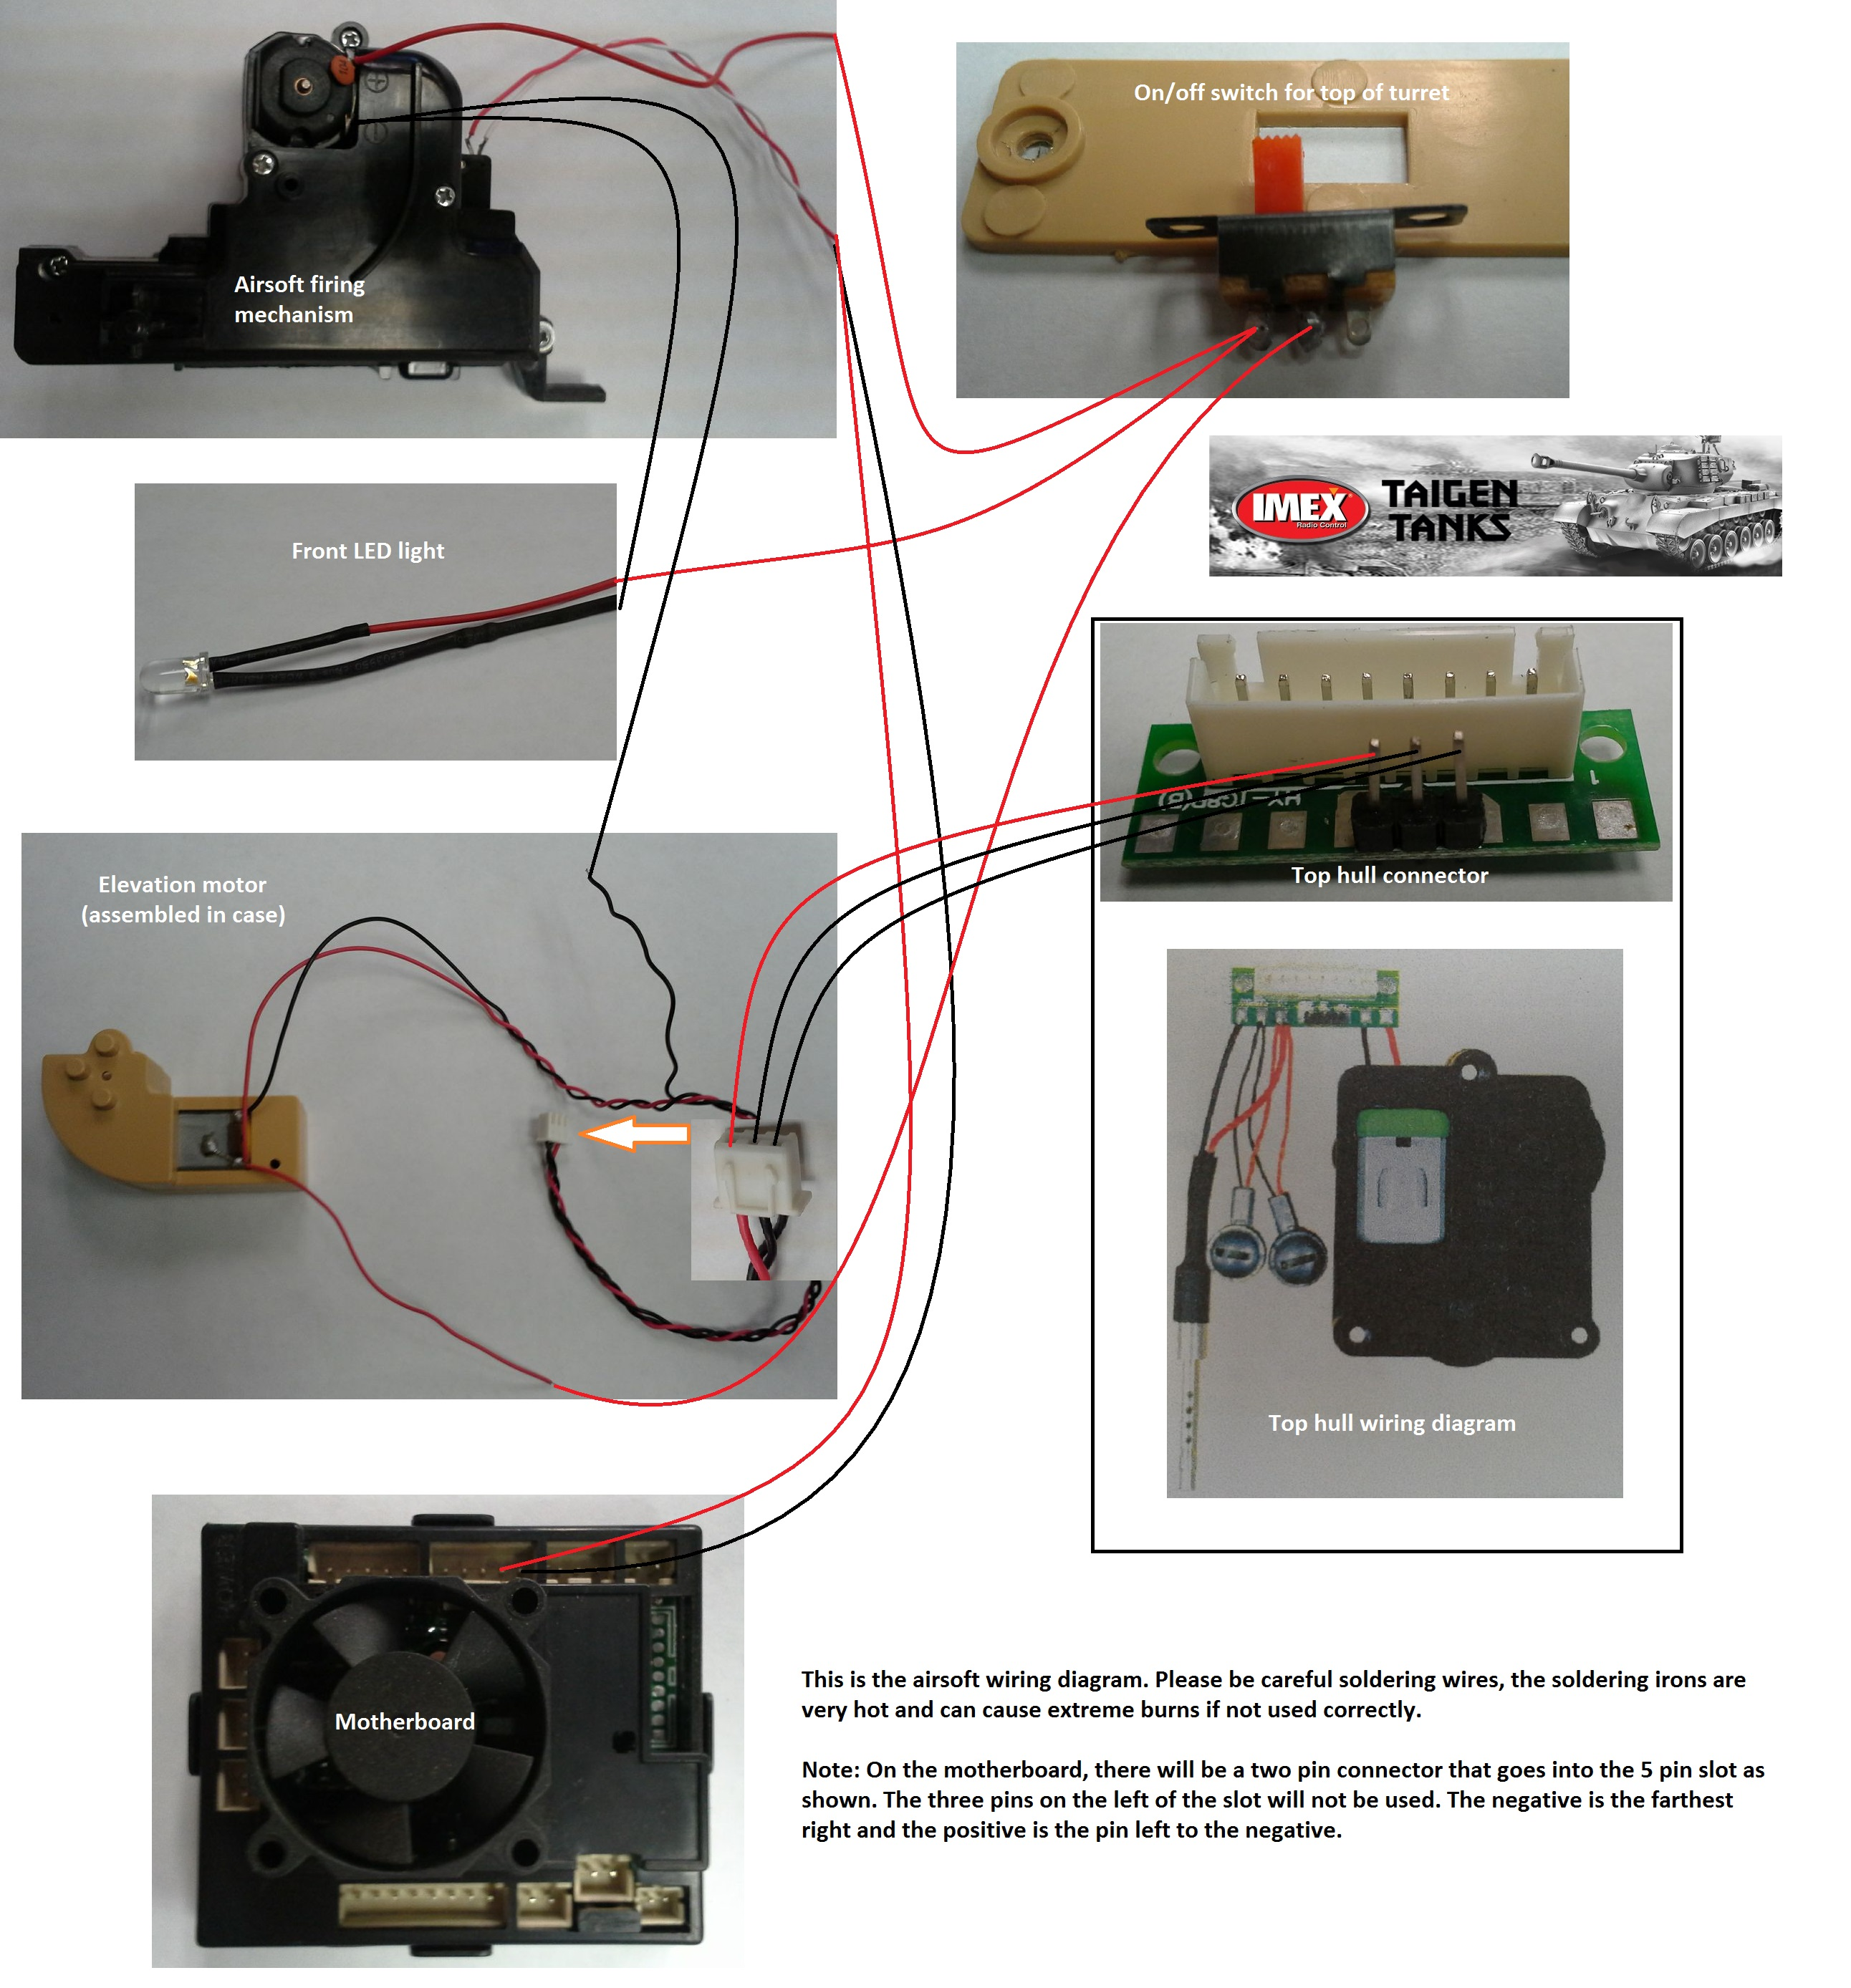 Click image for larger version  Name:Wiring Diagram for tiger main gun.jpg Views:197 Size:1.06 MB ID:2220997